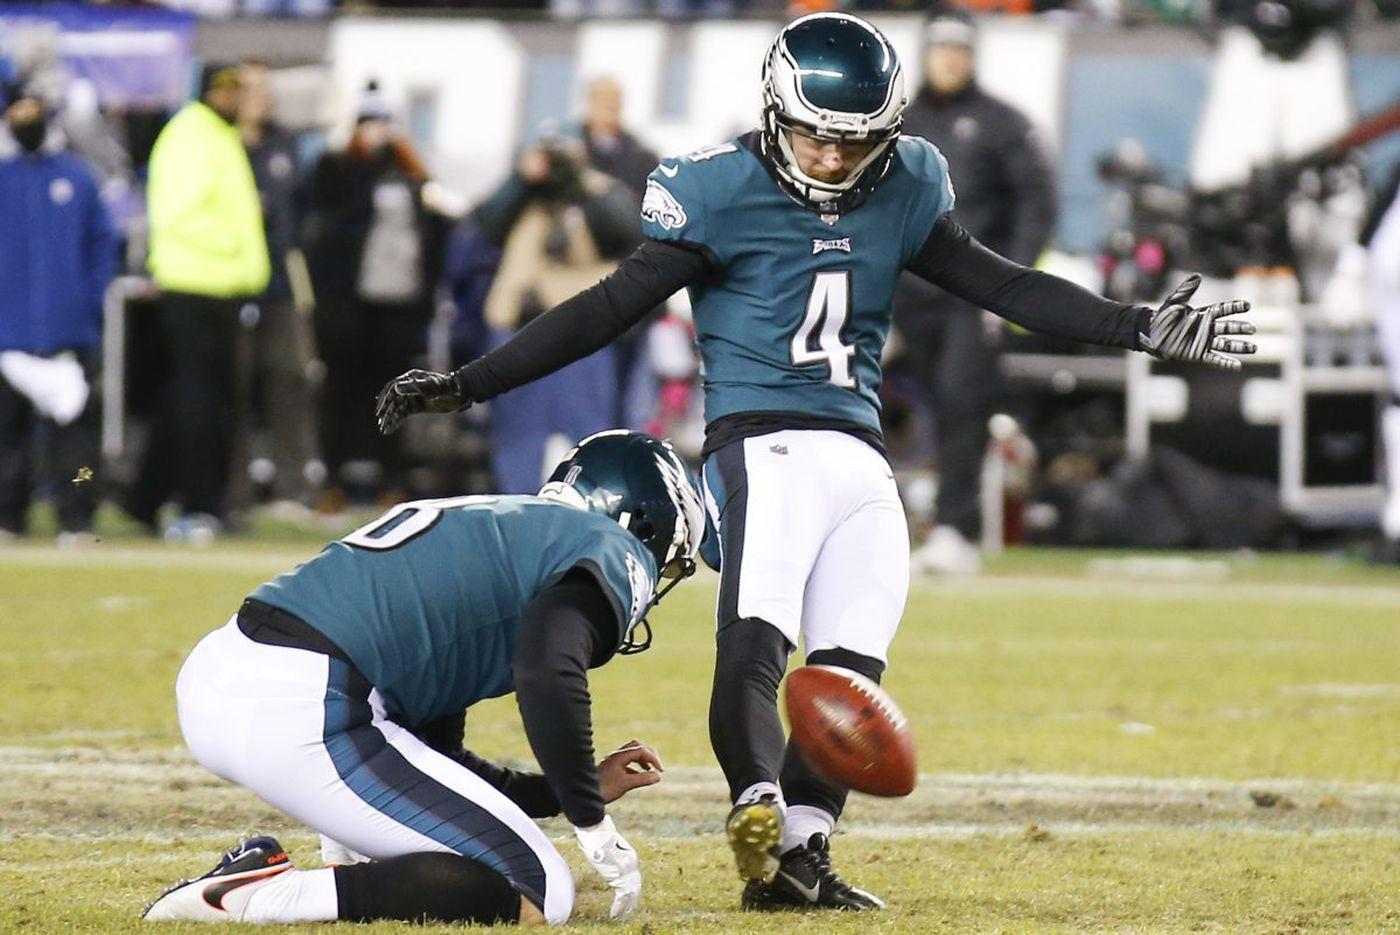 Eagles 15, Falcons 10 - as it happened